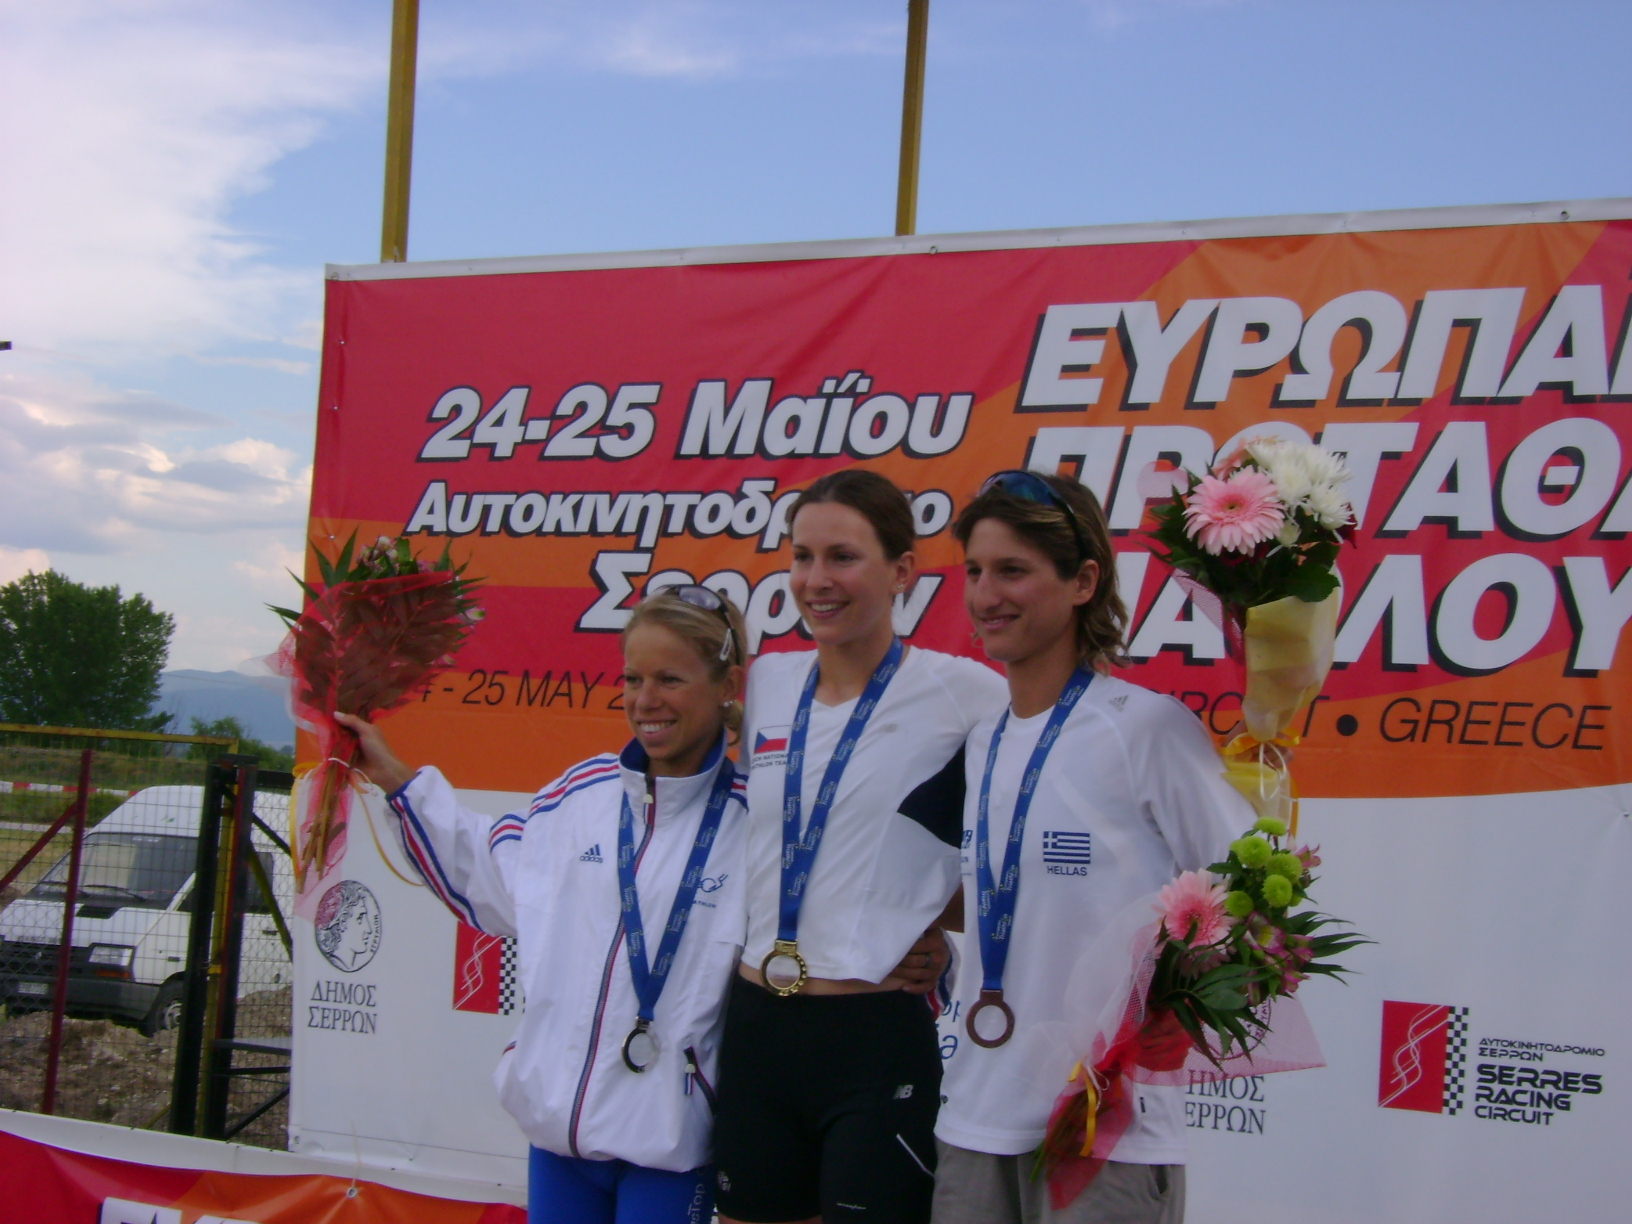 Victory_EURO_DUA_Podium_2008.jpg